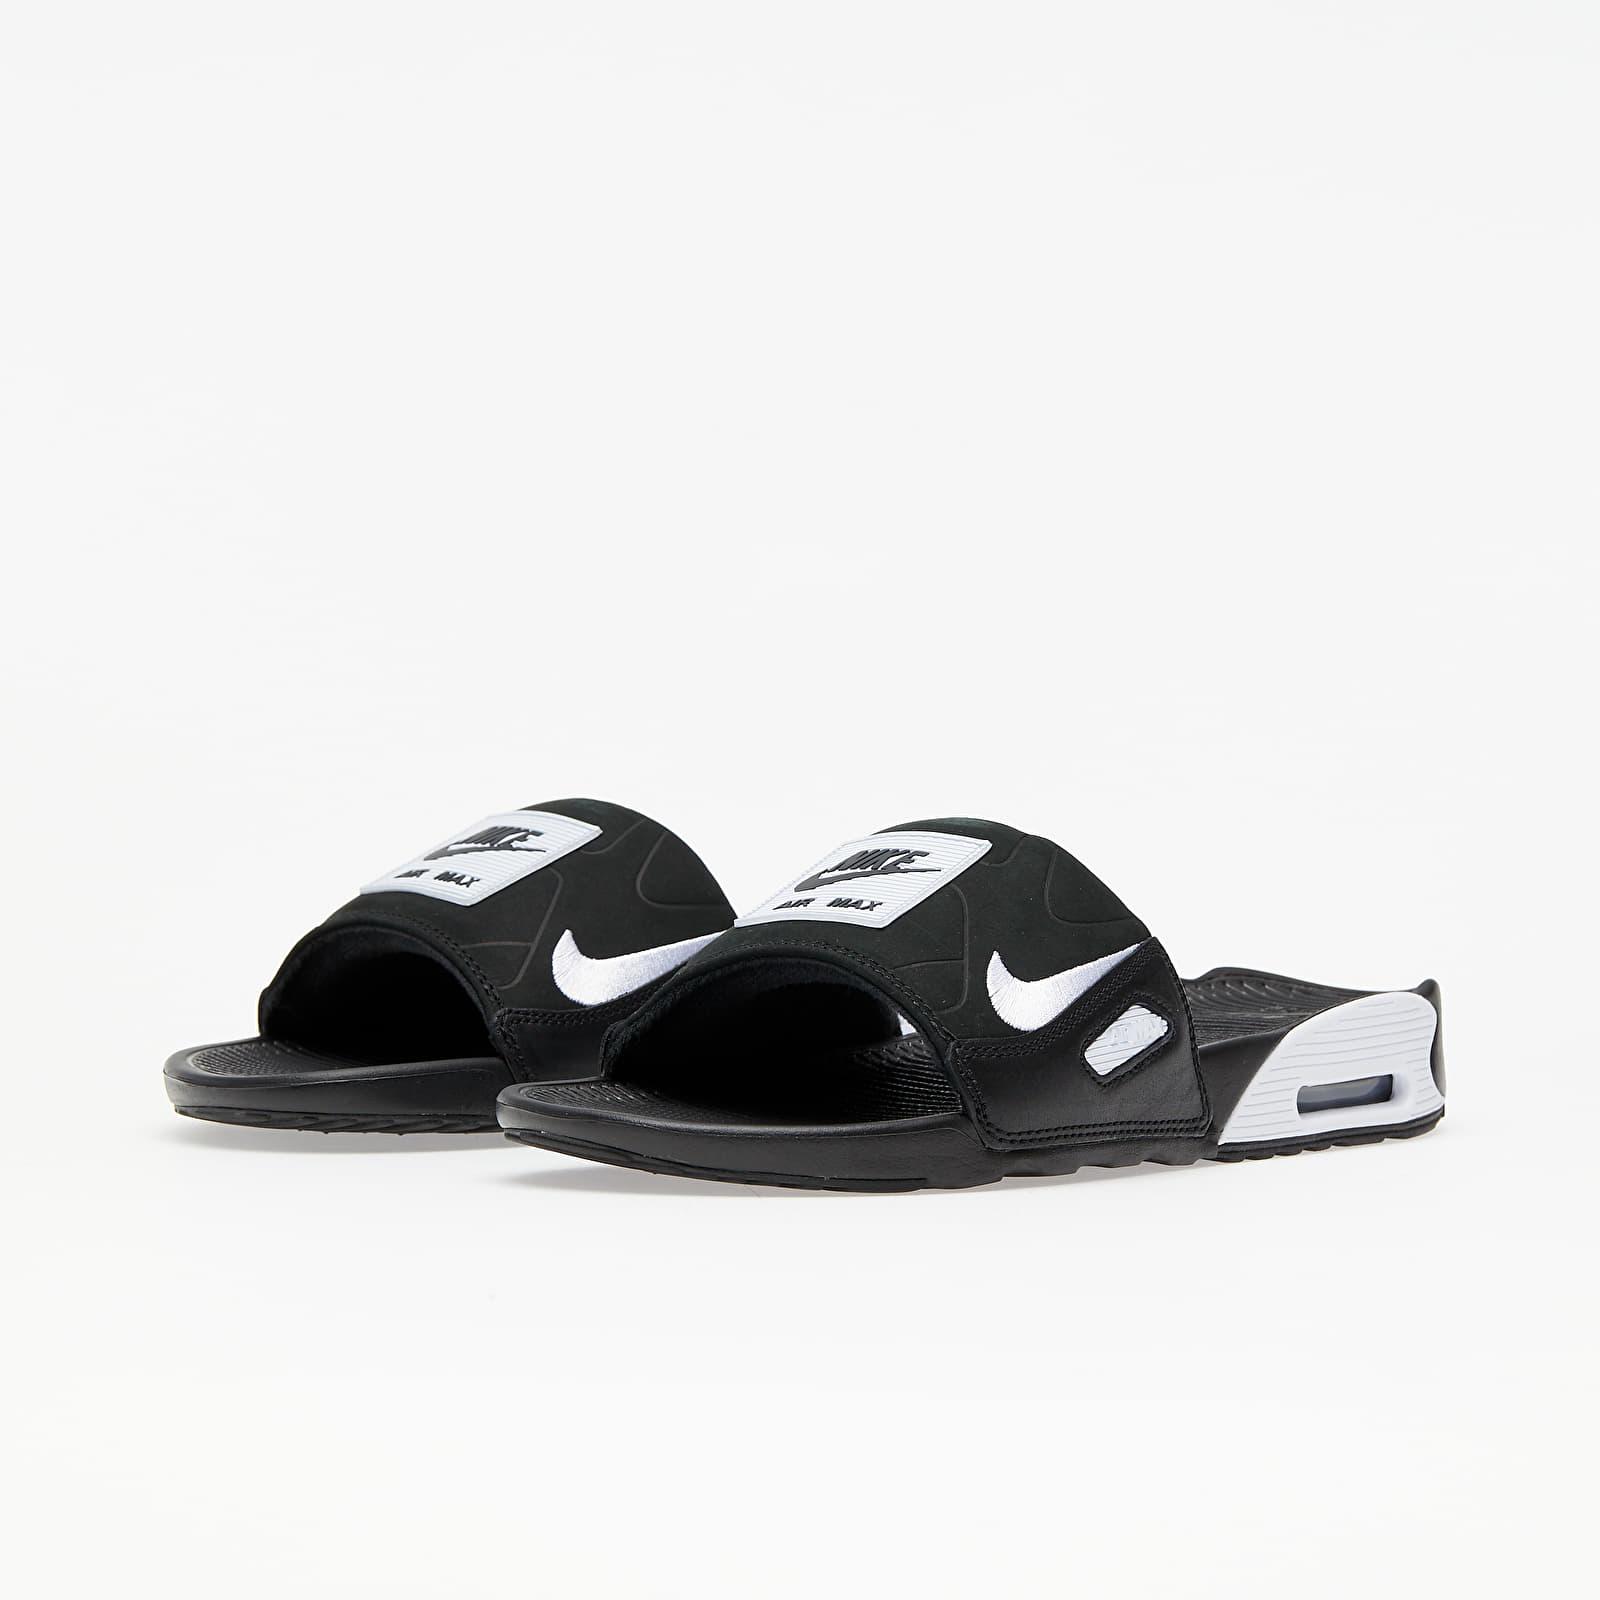 Chaussures et baskets homme Nike Air Max 90 Slide Black/ White ...